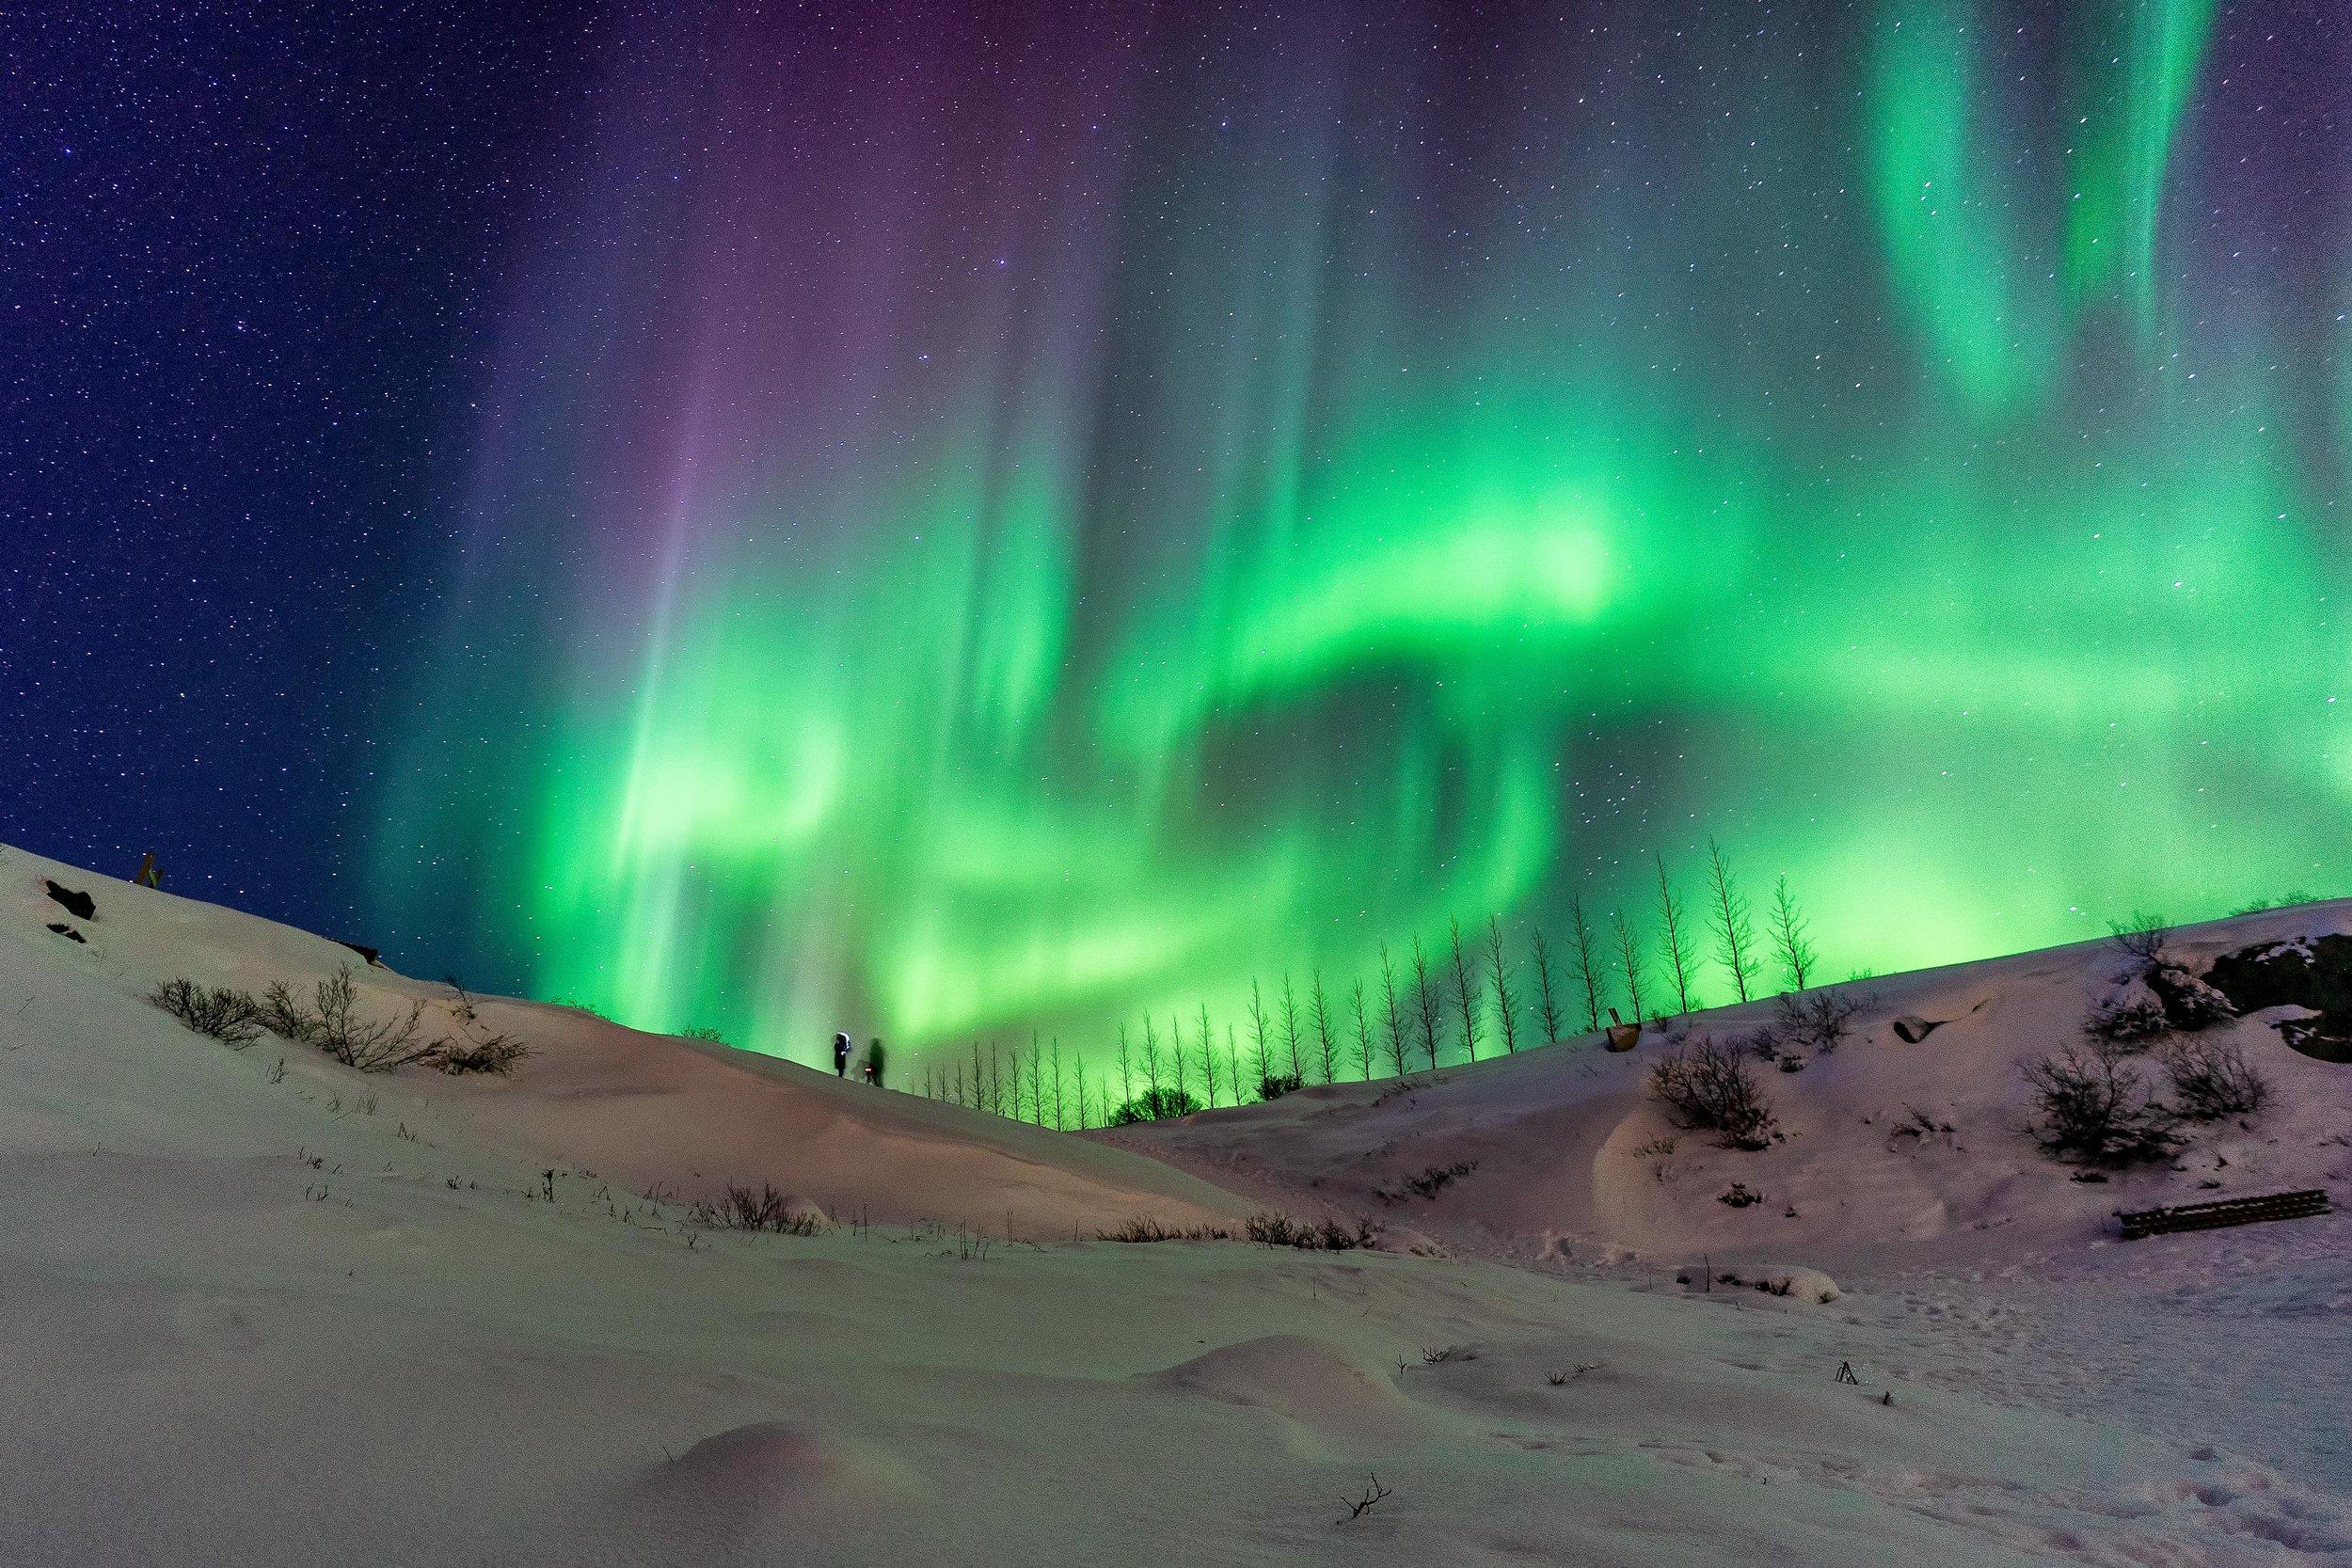 Iceland. snow. travel. adventure. photography. trip. epic landscape. snow. cold. freezing. sunrise. nothern lights. couple underlights.jpg